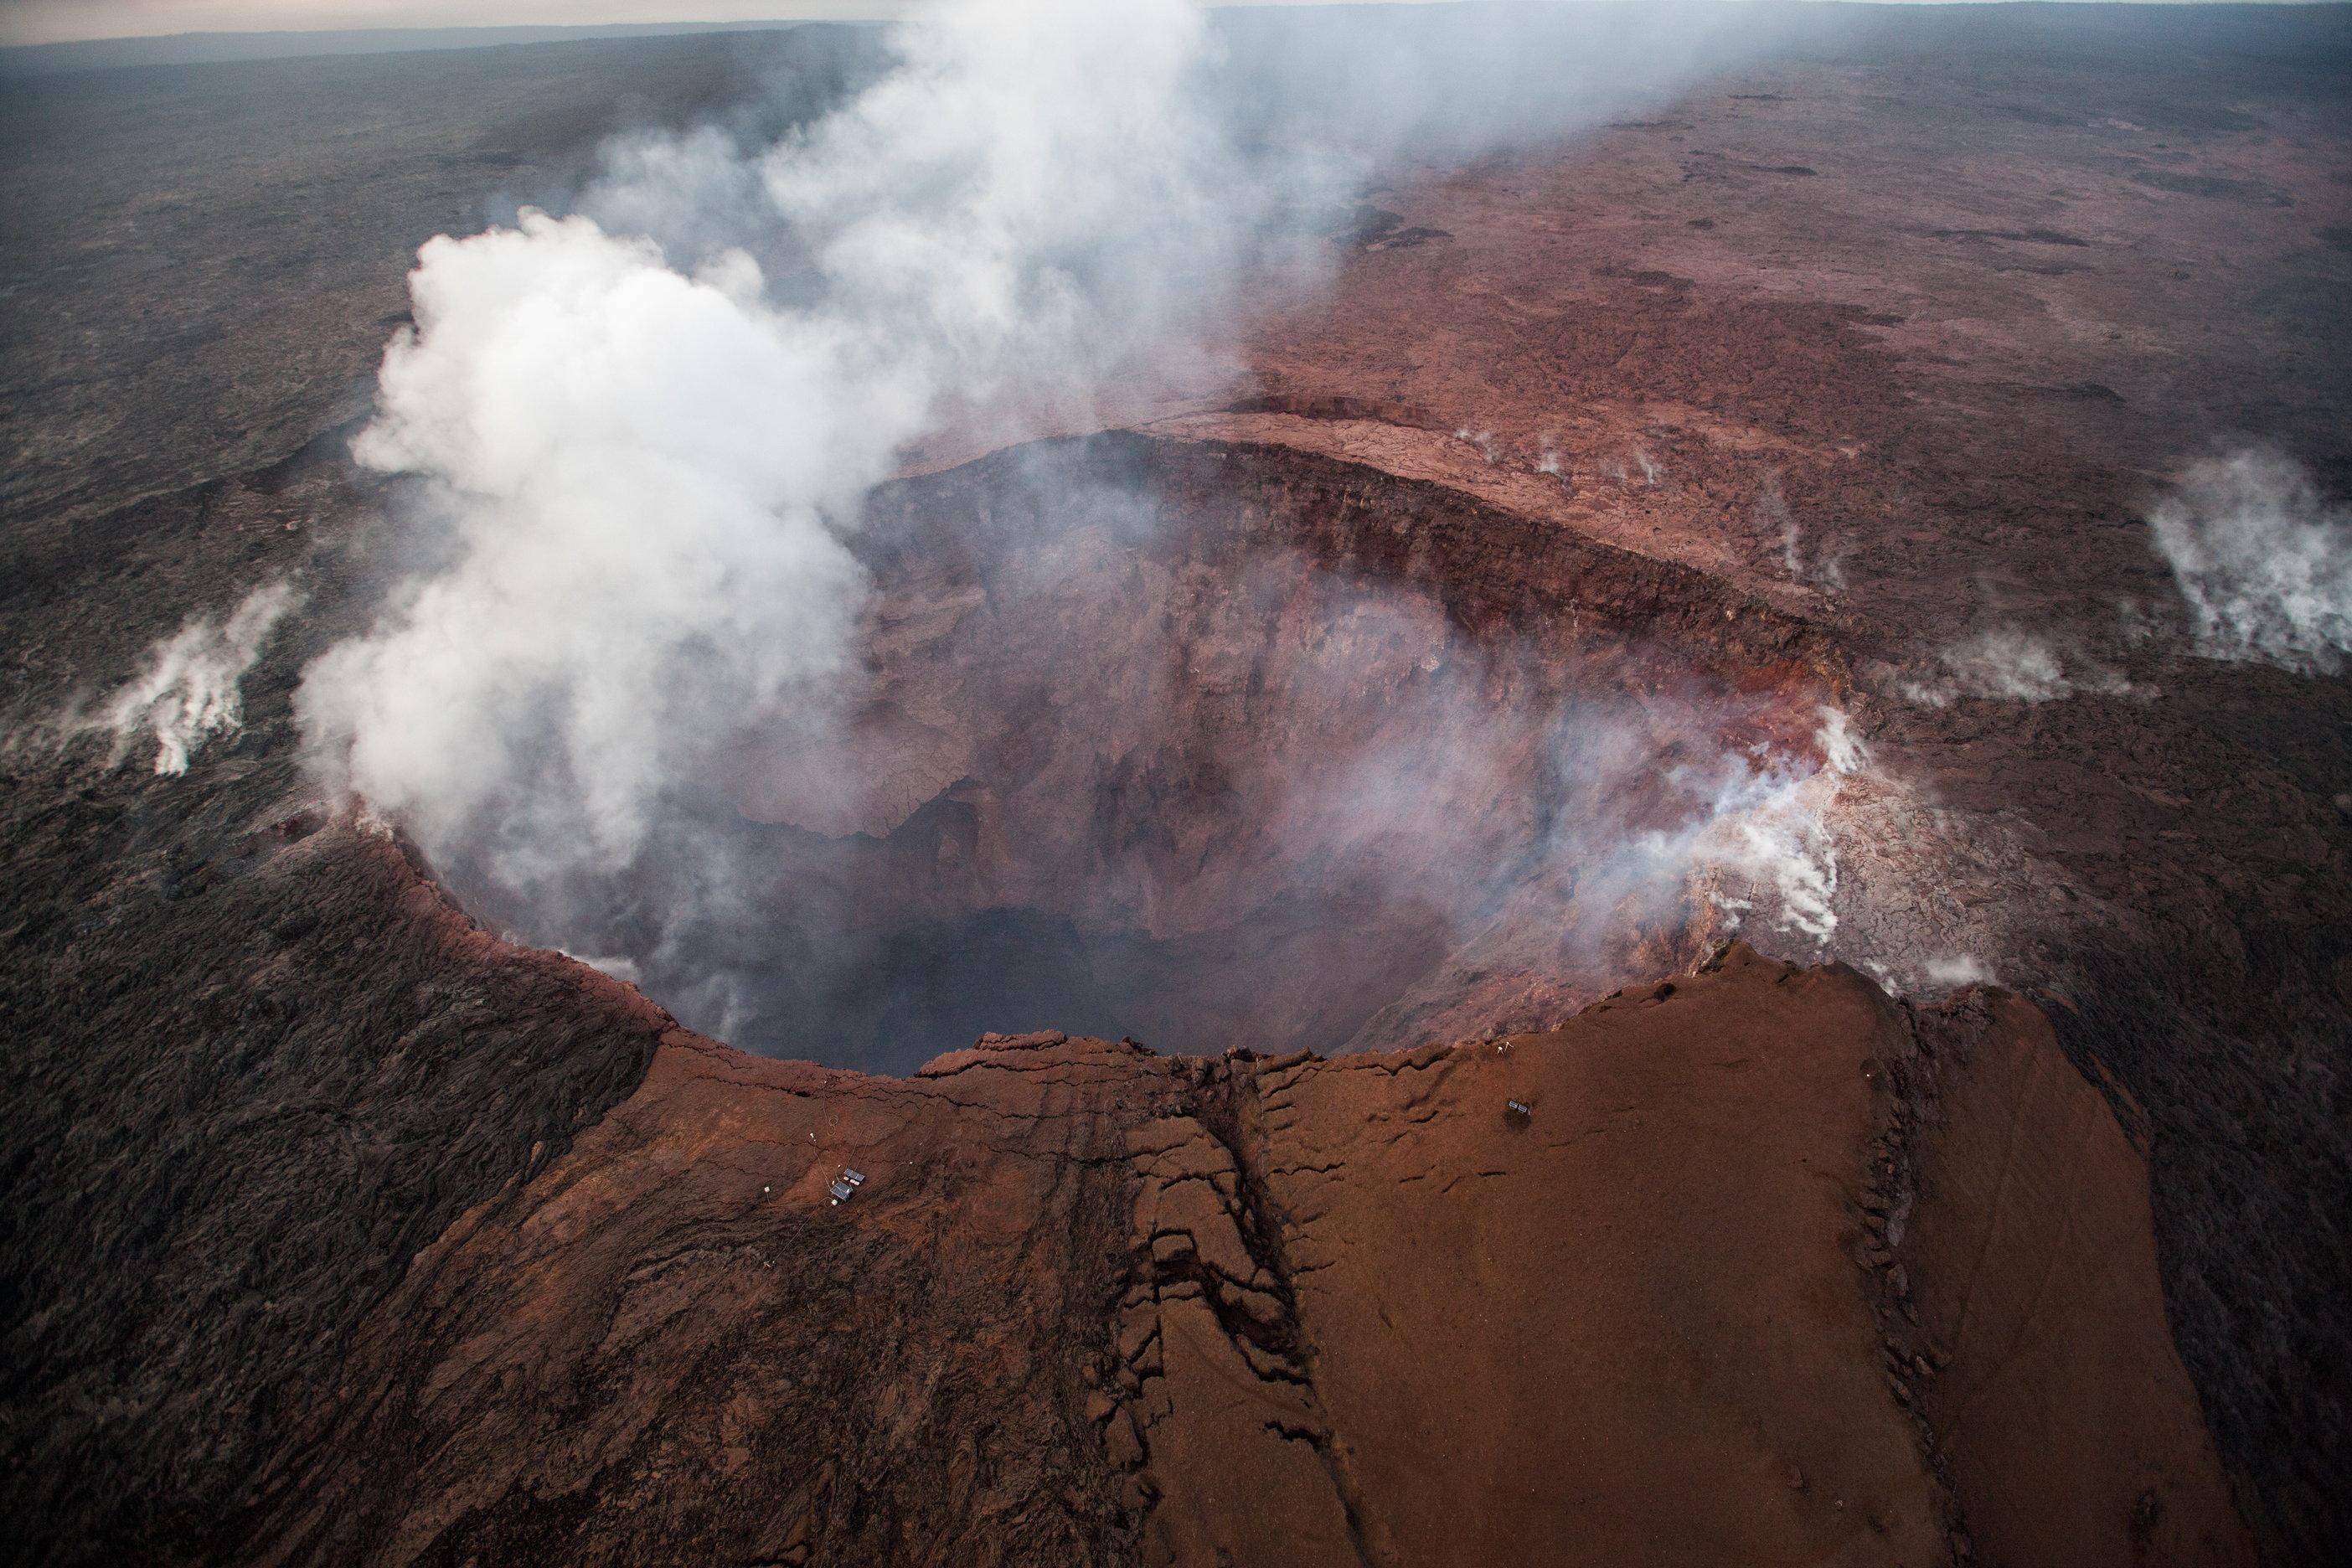 GUATEMALA Potres jakosti 5,2 po Richteru i nova erupcija vulkana